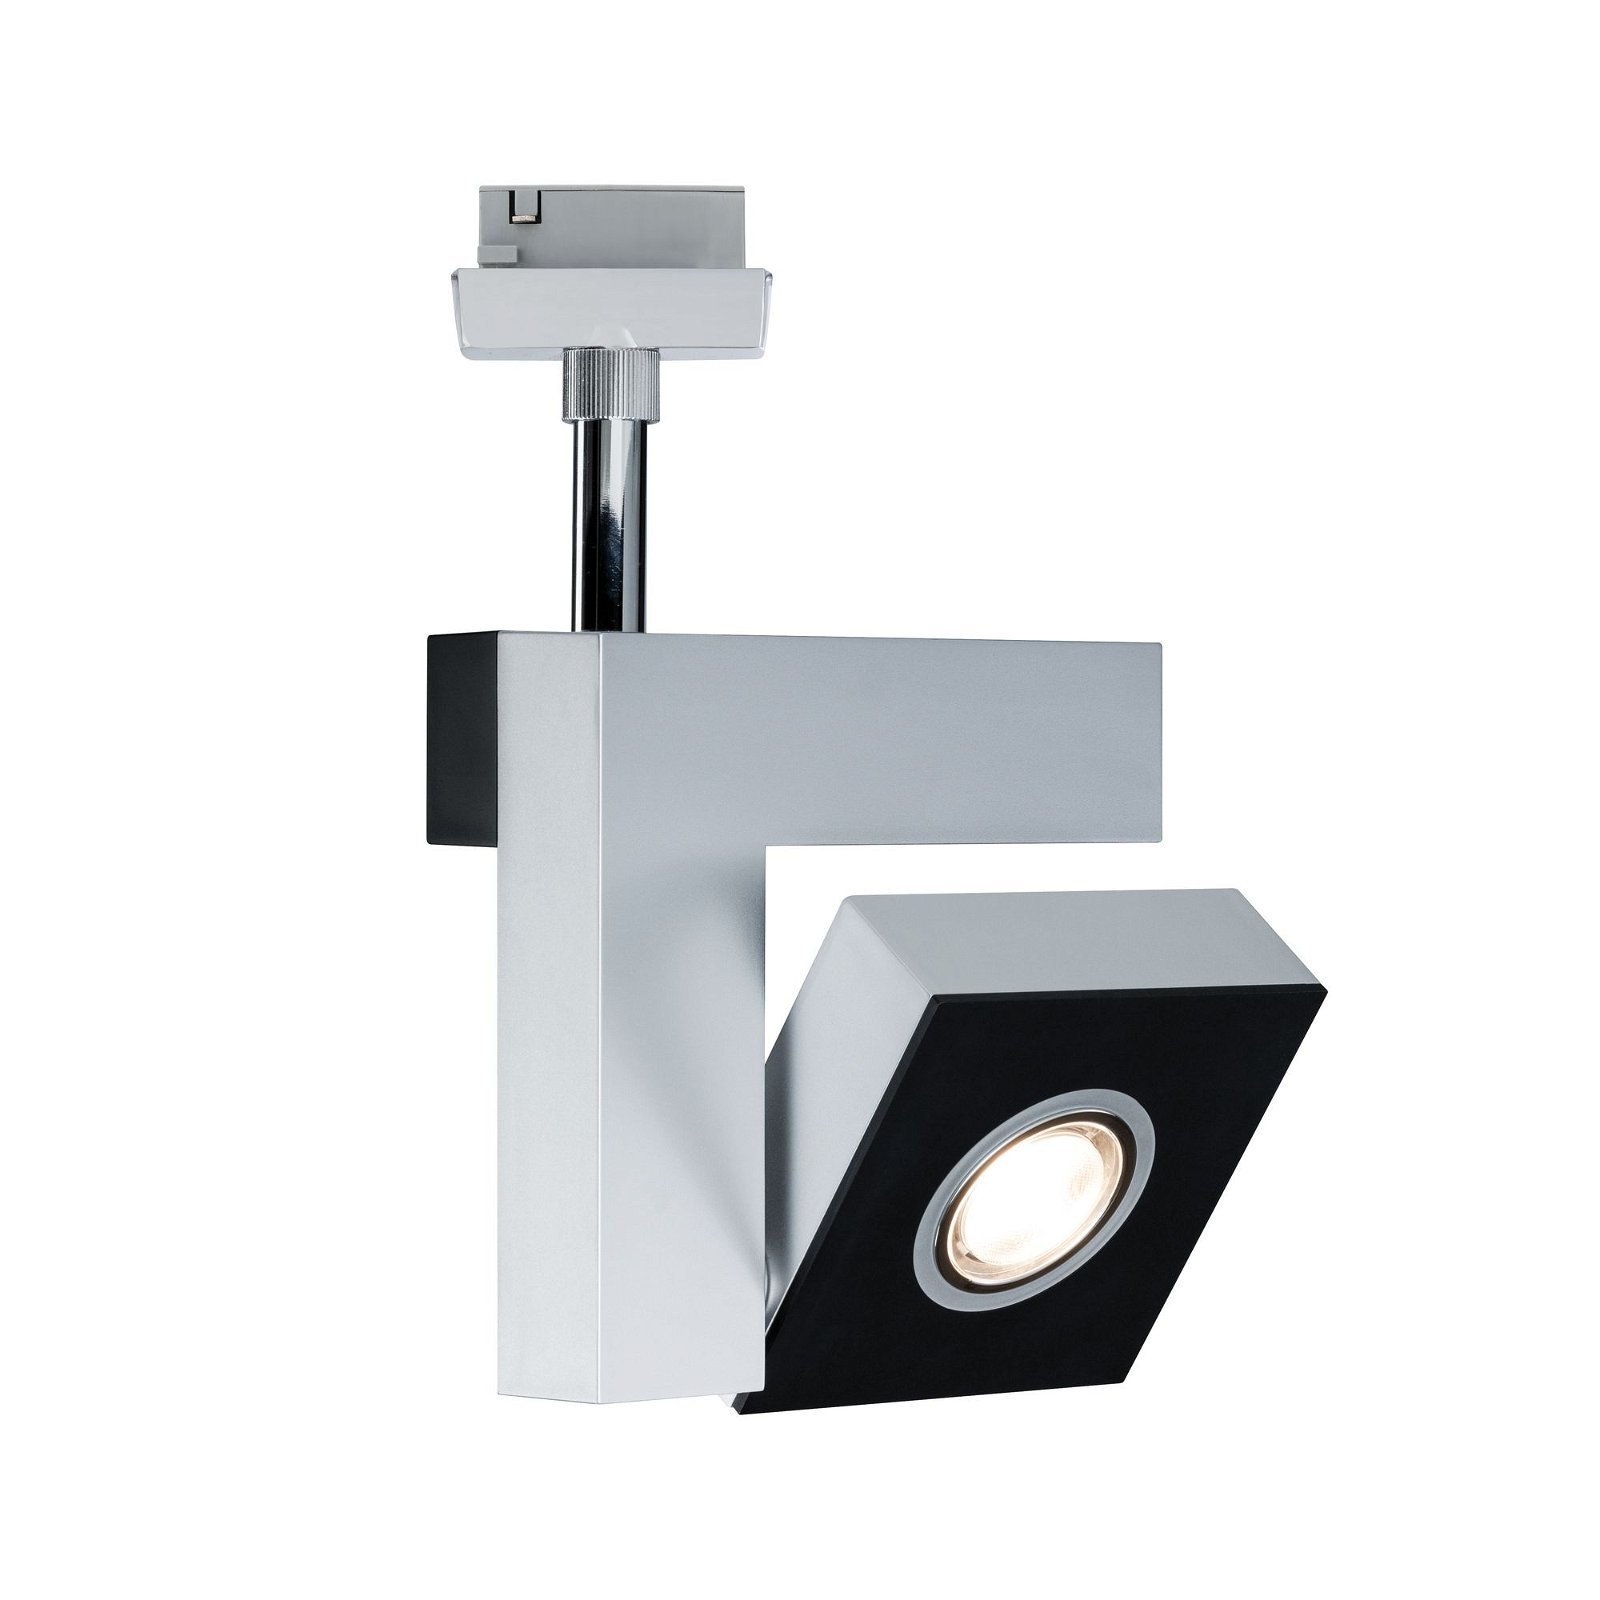 VariLine LED Spot Square 10W Chrom matt/Schwarz matt